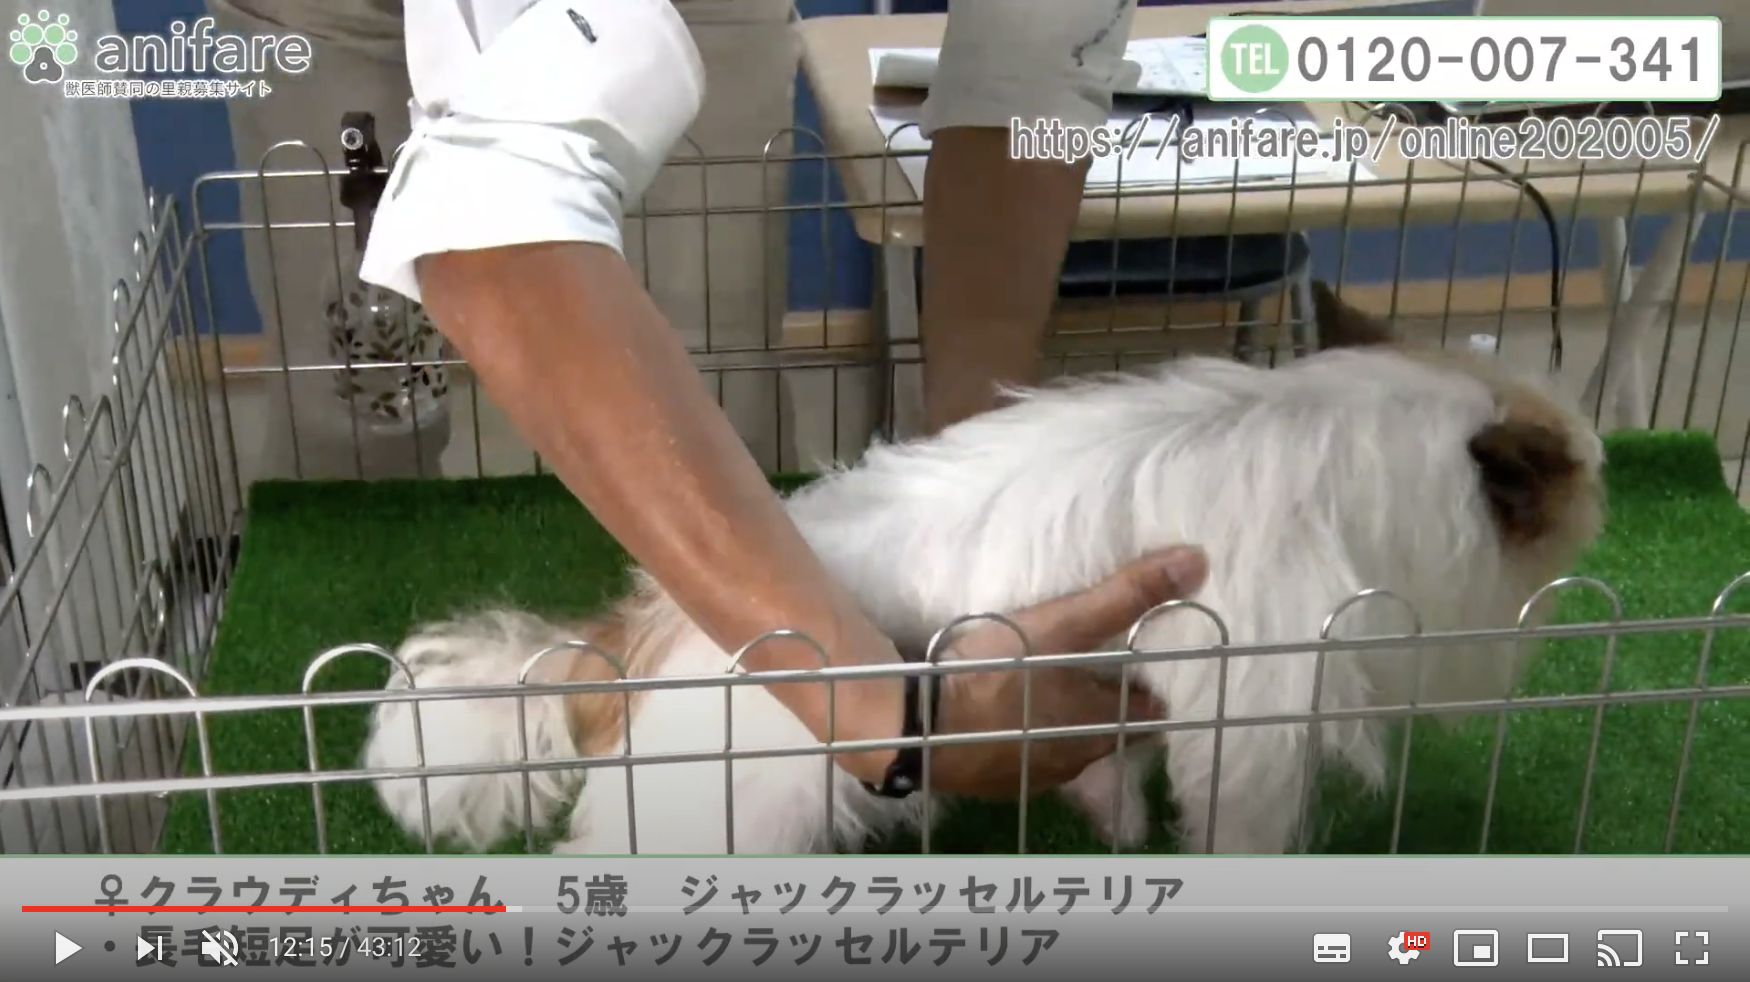 anifareが保護犬の「オンライン譲渡会」を初開催します!